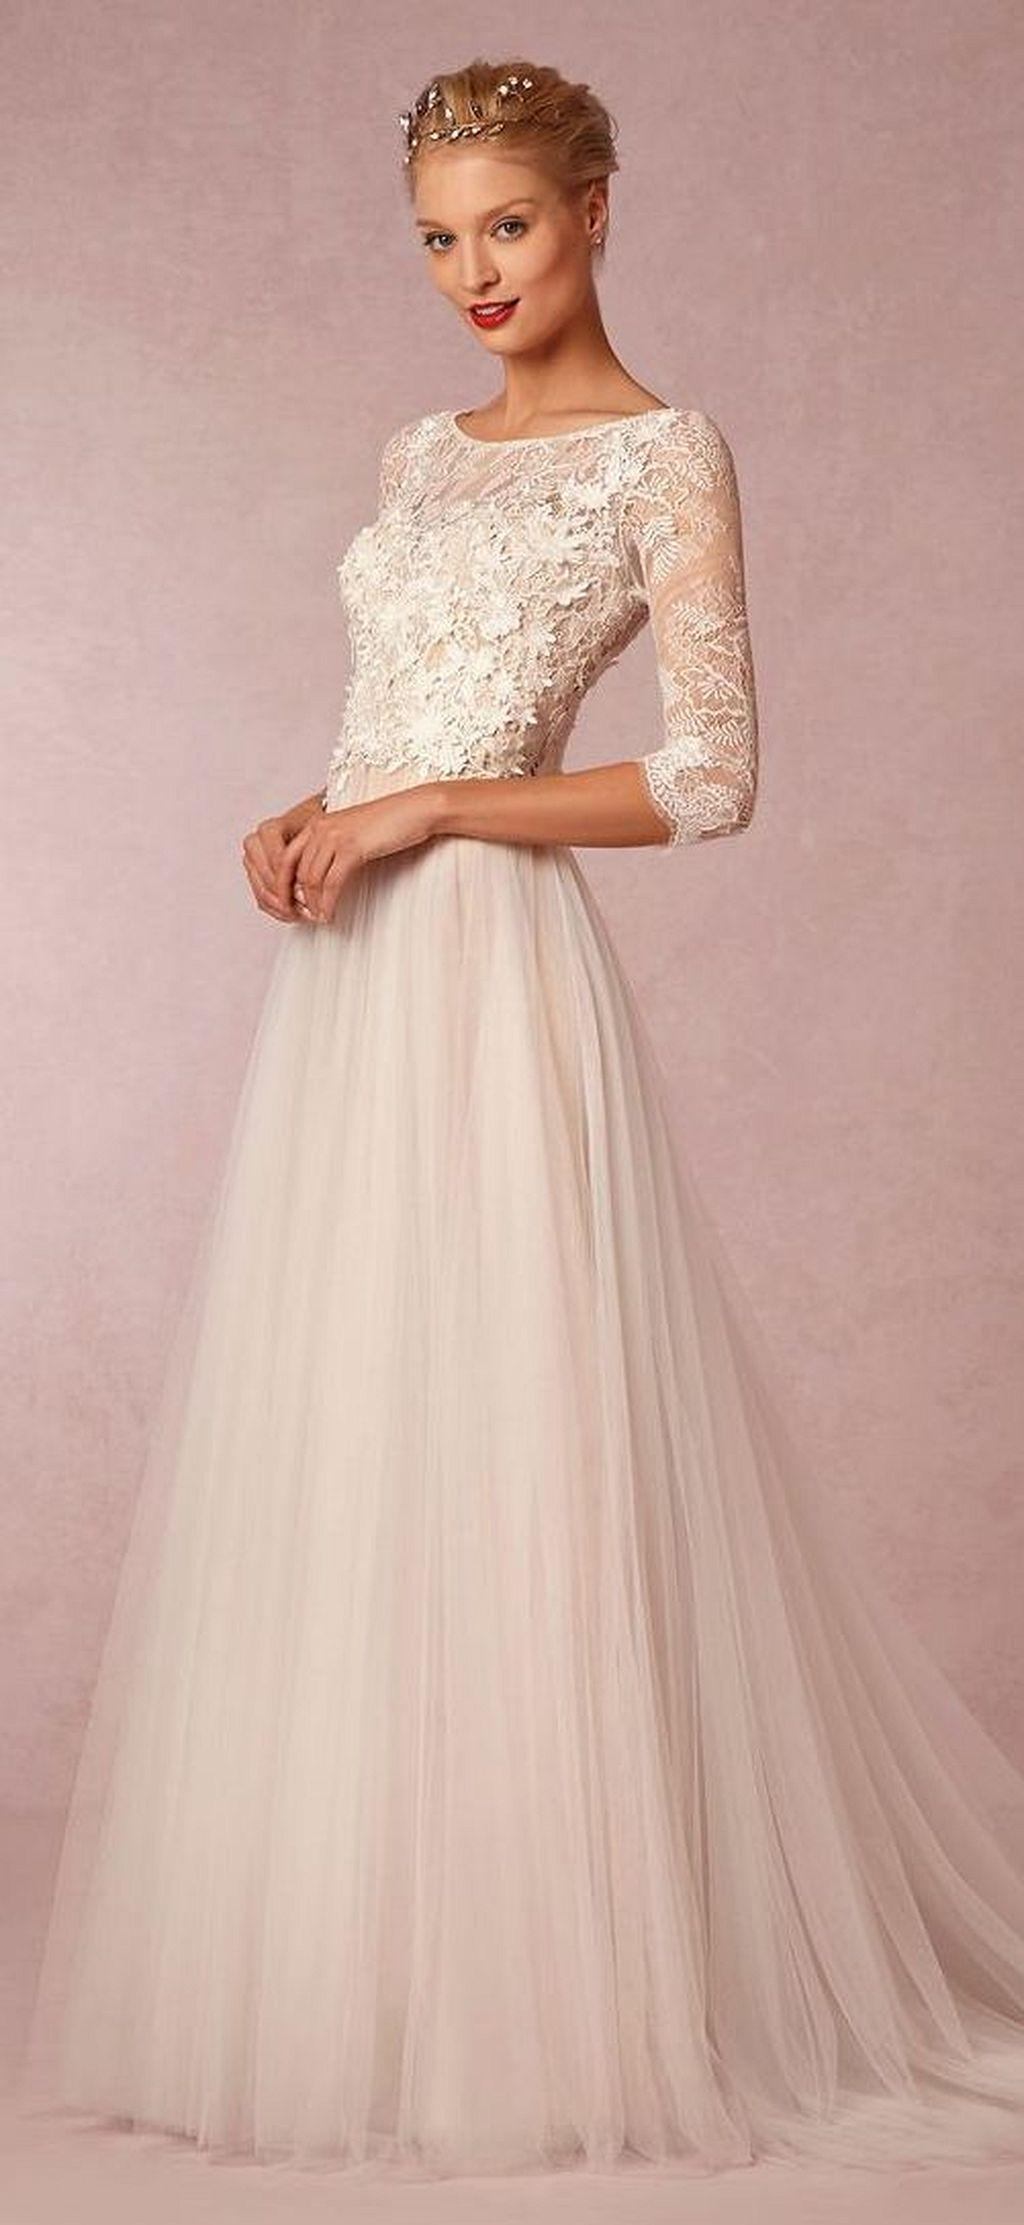 170 Vintage Wedding Dress Ideas